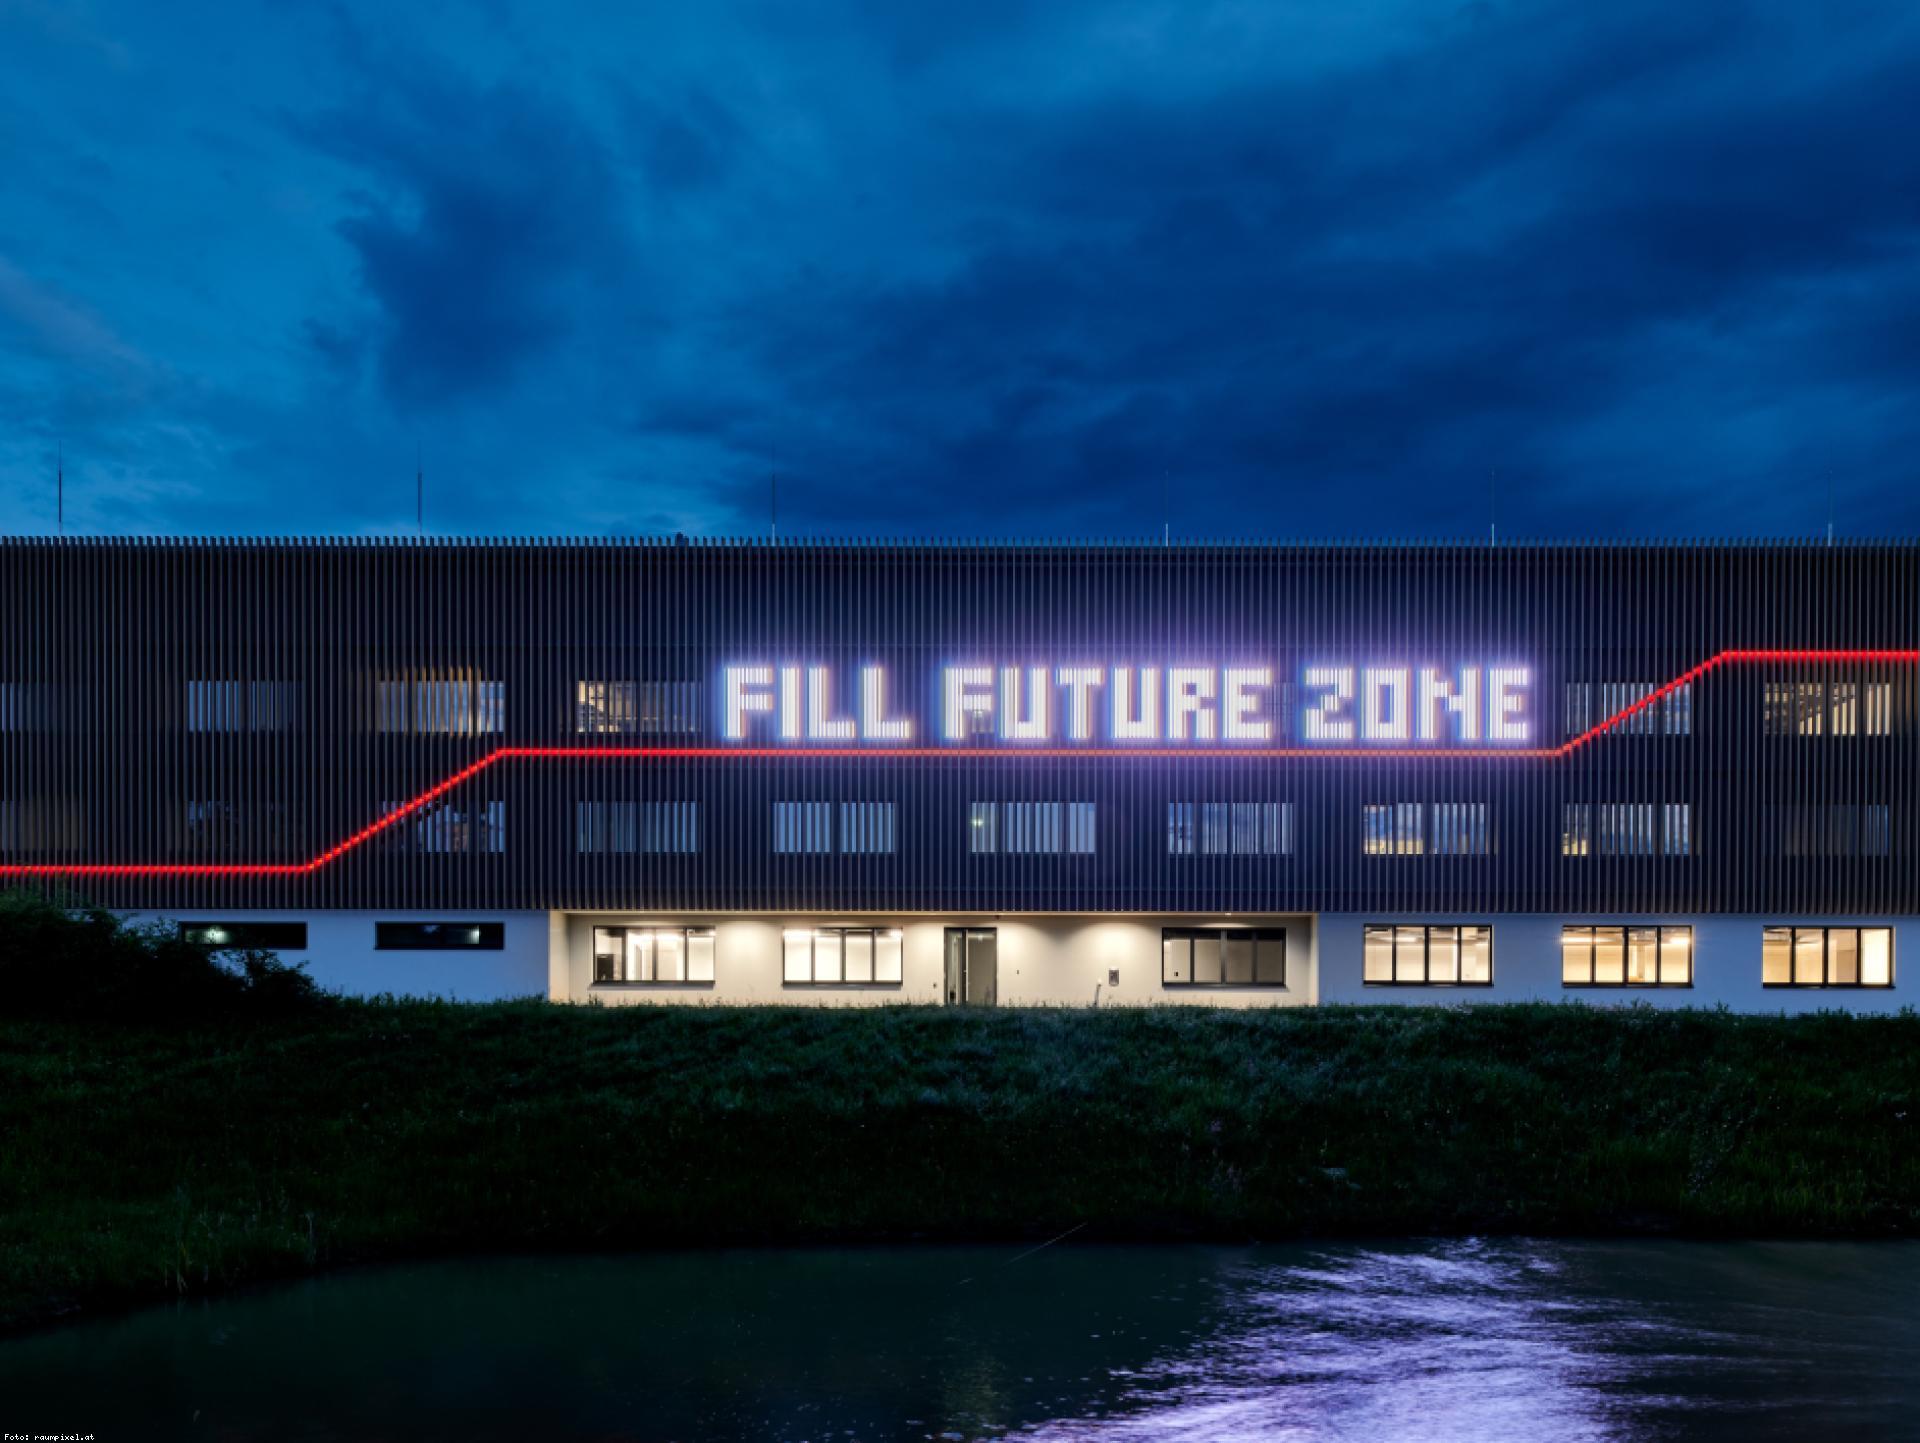 Mood-Image EBG Referenz: Fill GmbH - Innovations- und Forschungszentrum P21